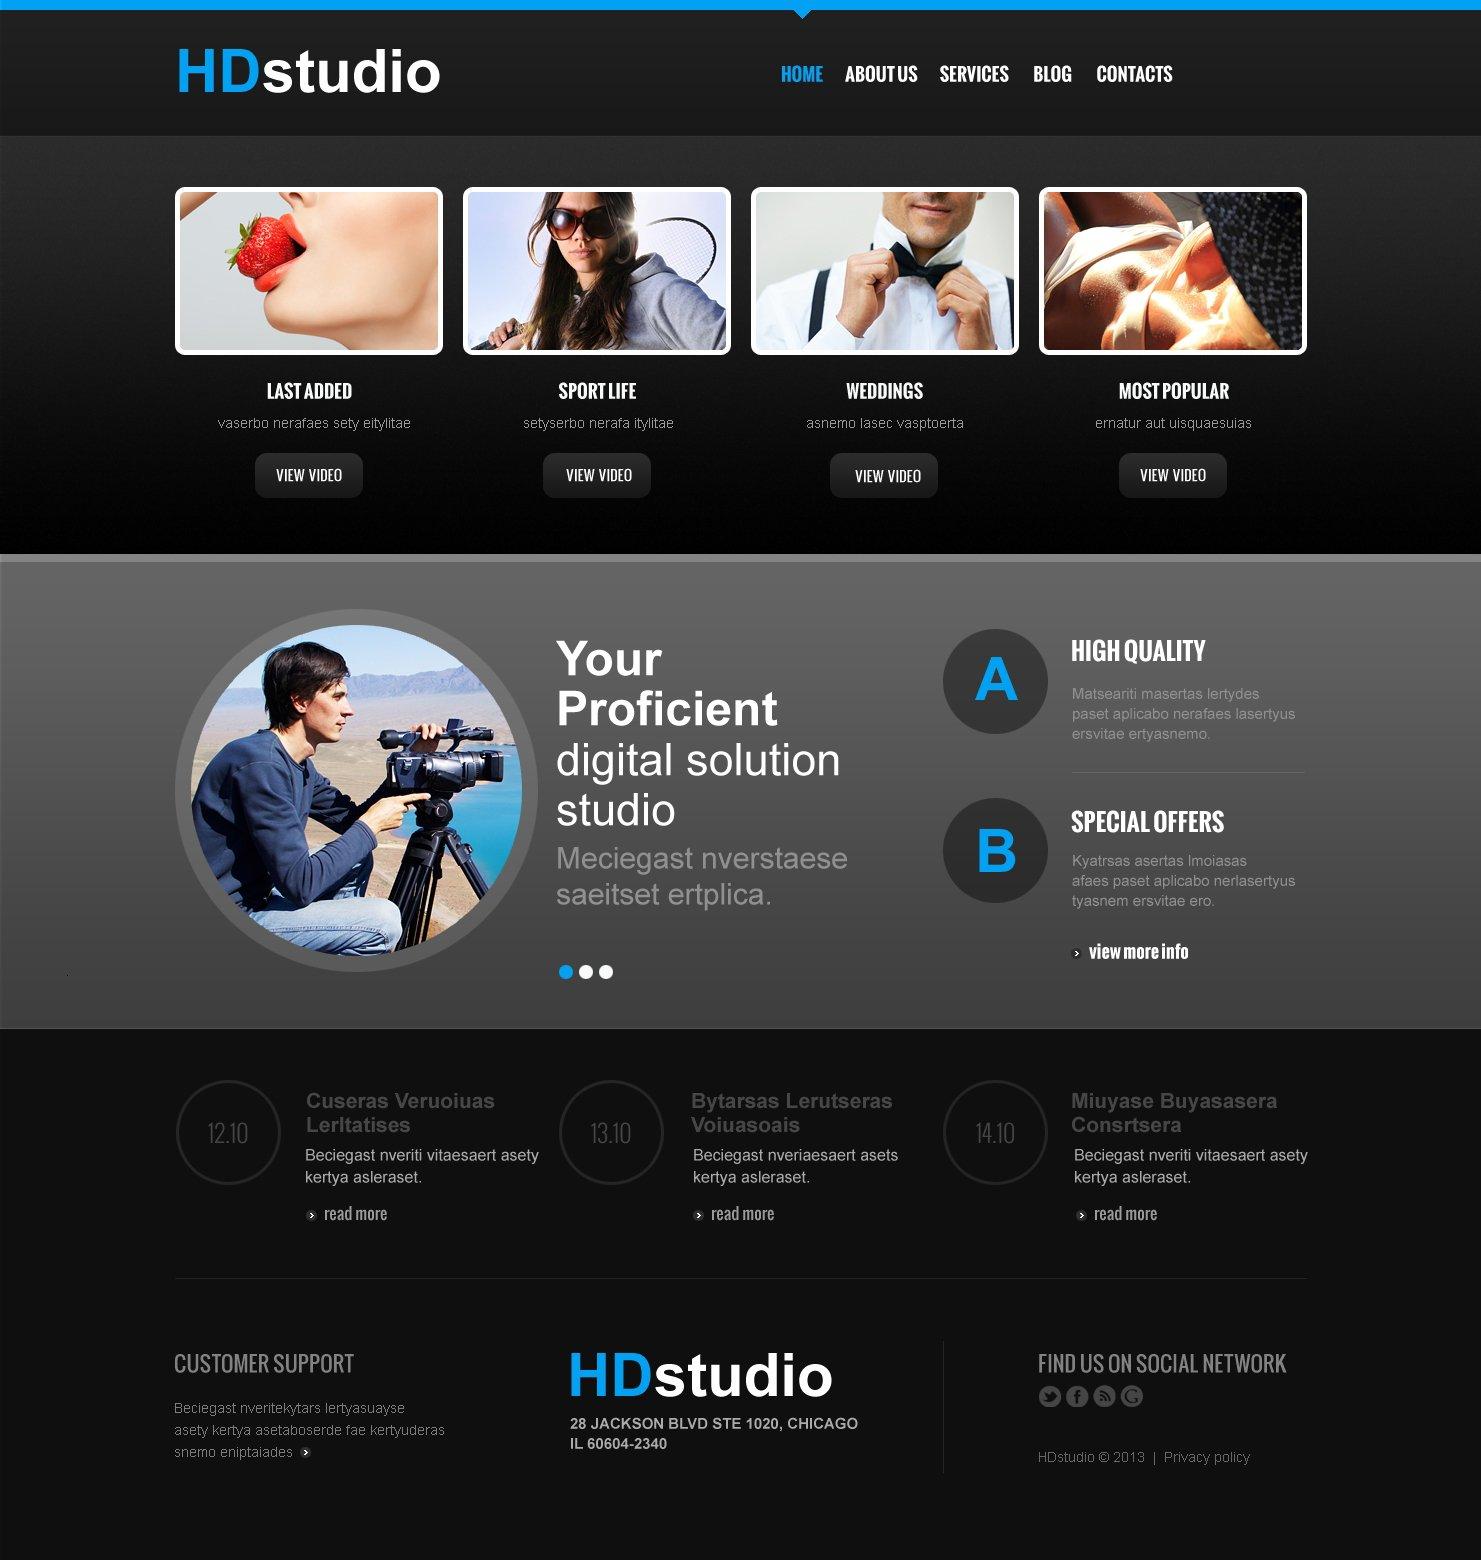 Best Hd Studio Videographer Joomla Design 47154 Sale Super Low Price Free Bonuses Instant Download